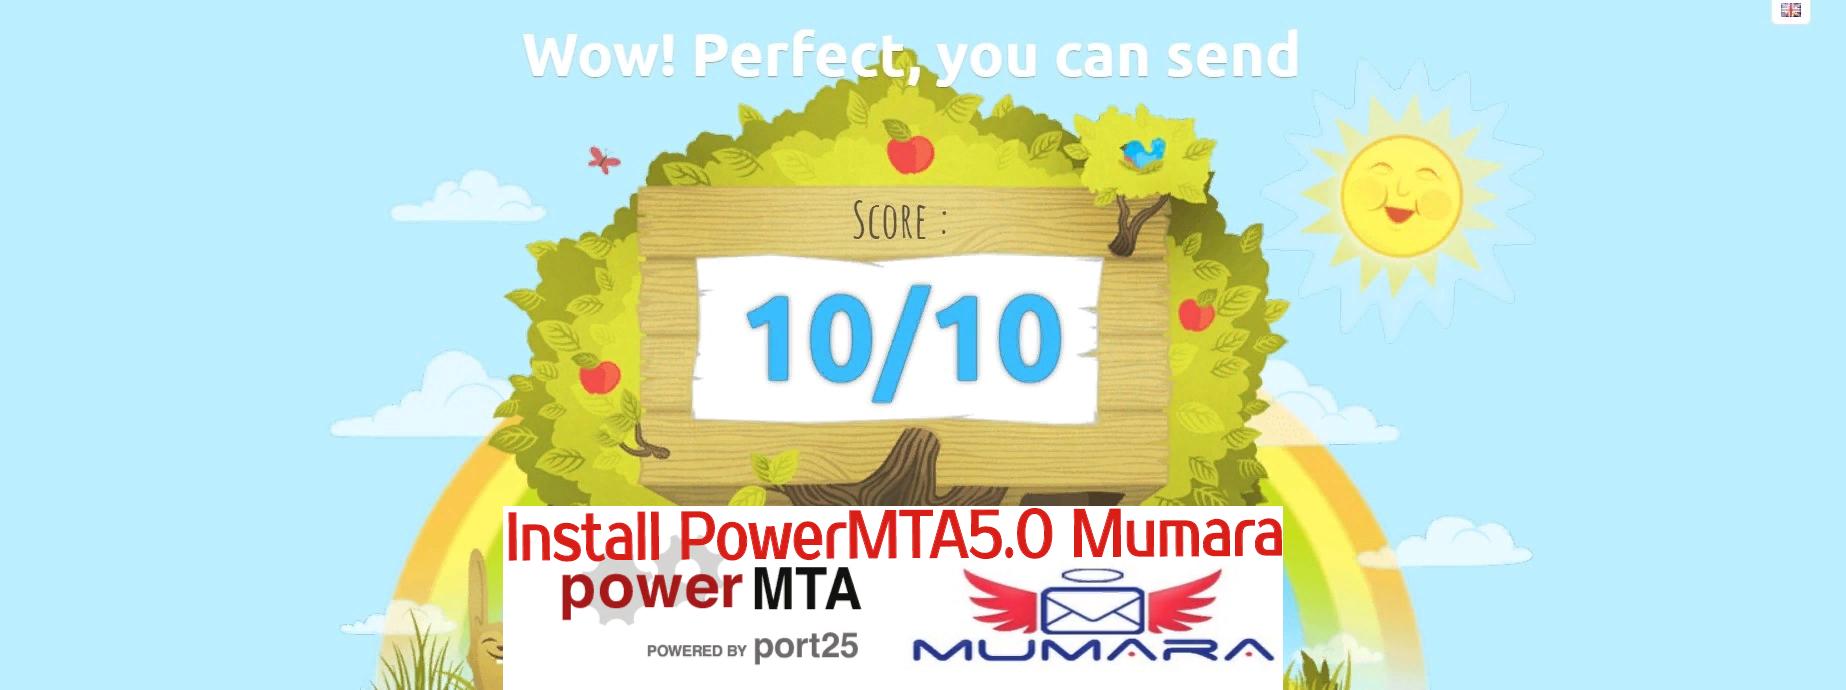 I Install PowerMTA5.0+Mumara on your server or vps